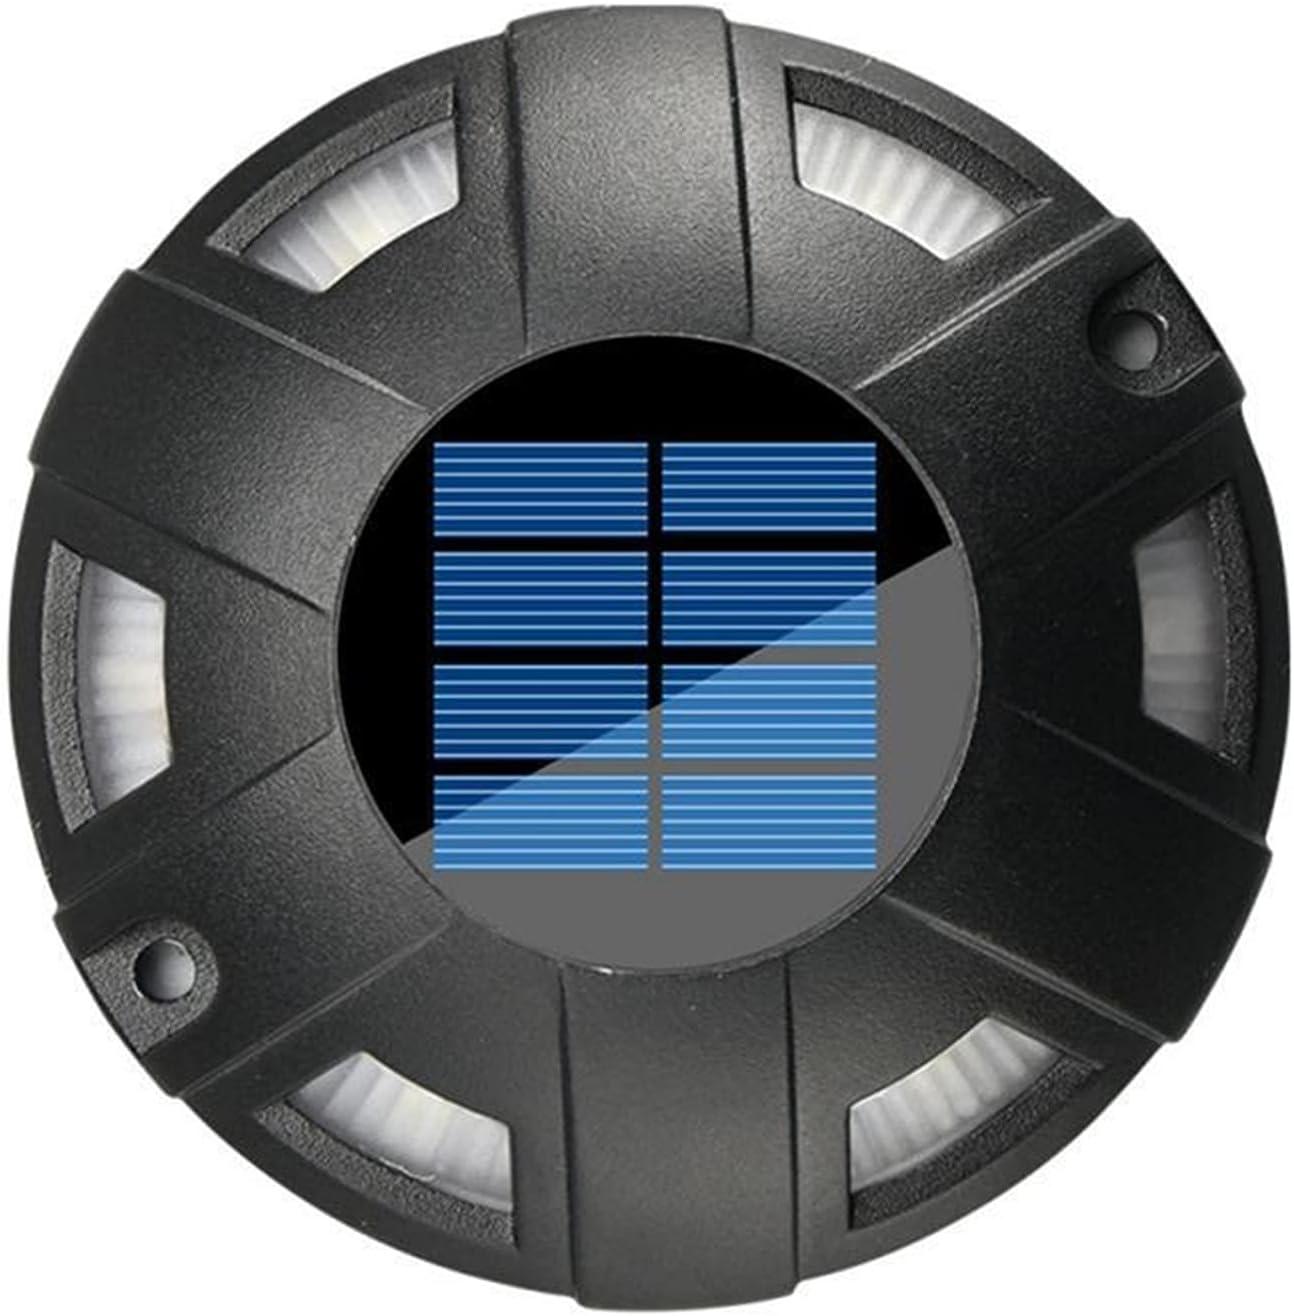 ZHM quality Cheap mail order shopping assurance Solar Deck Lights 4 Pack LED Light Outdoor Wat Powered